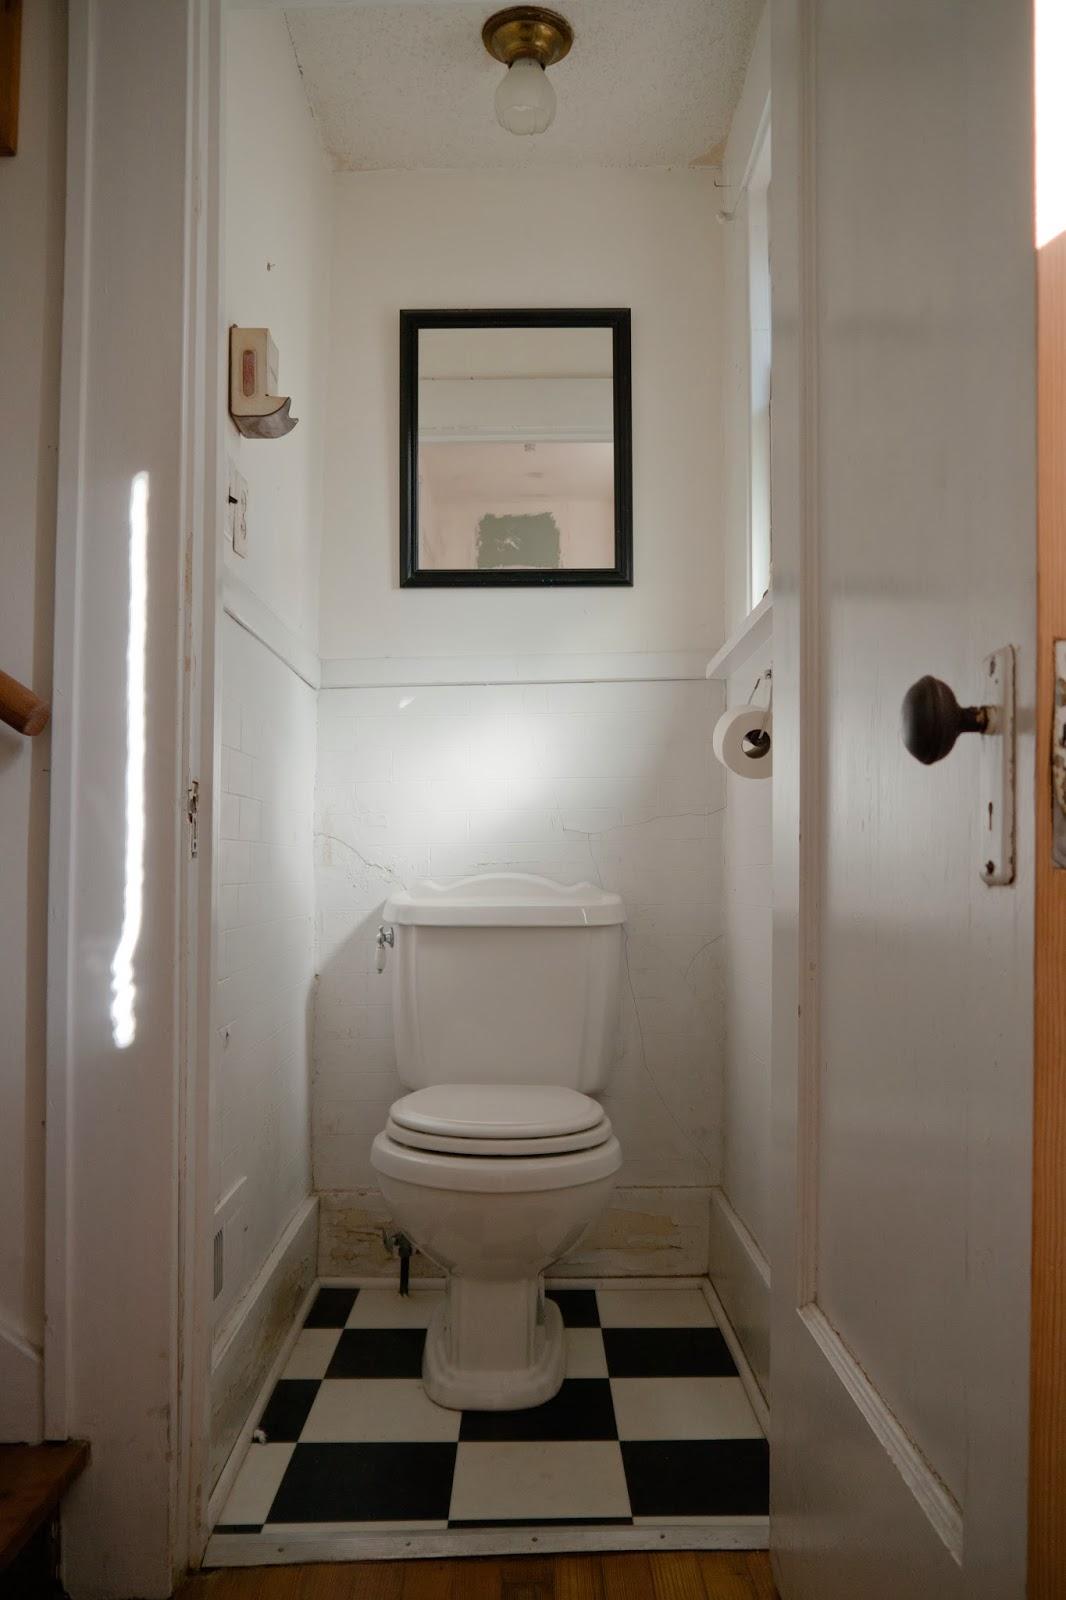 Keep Smiling Toilet Closet Demo Day 1